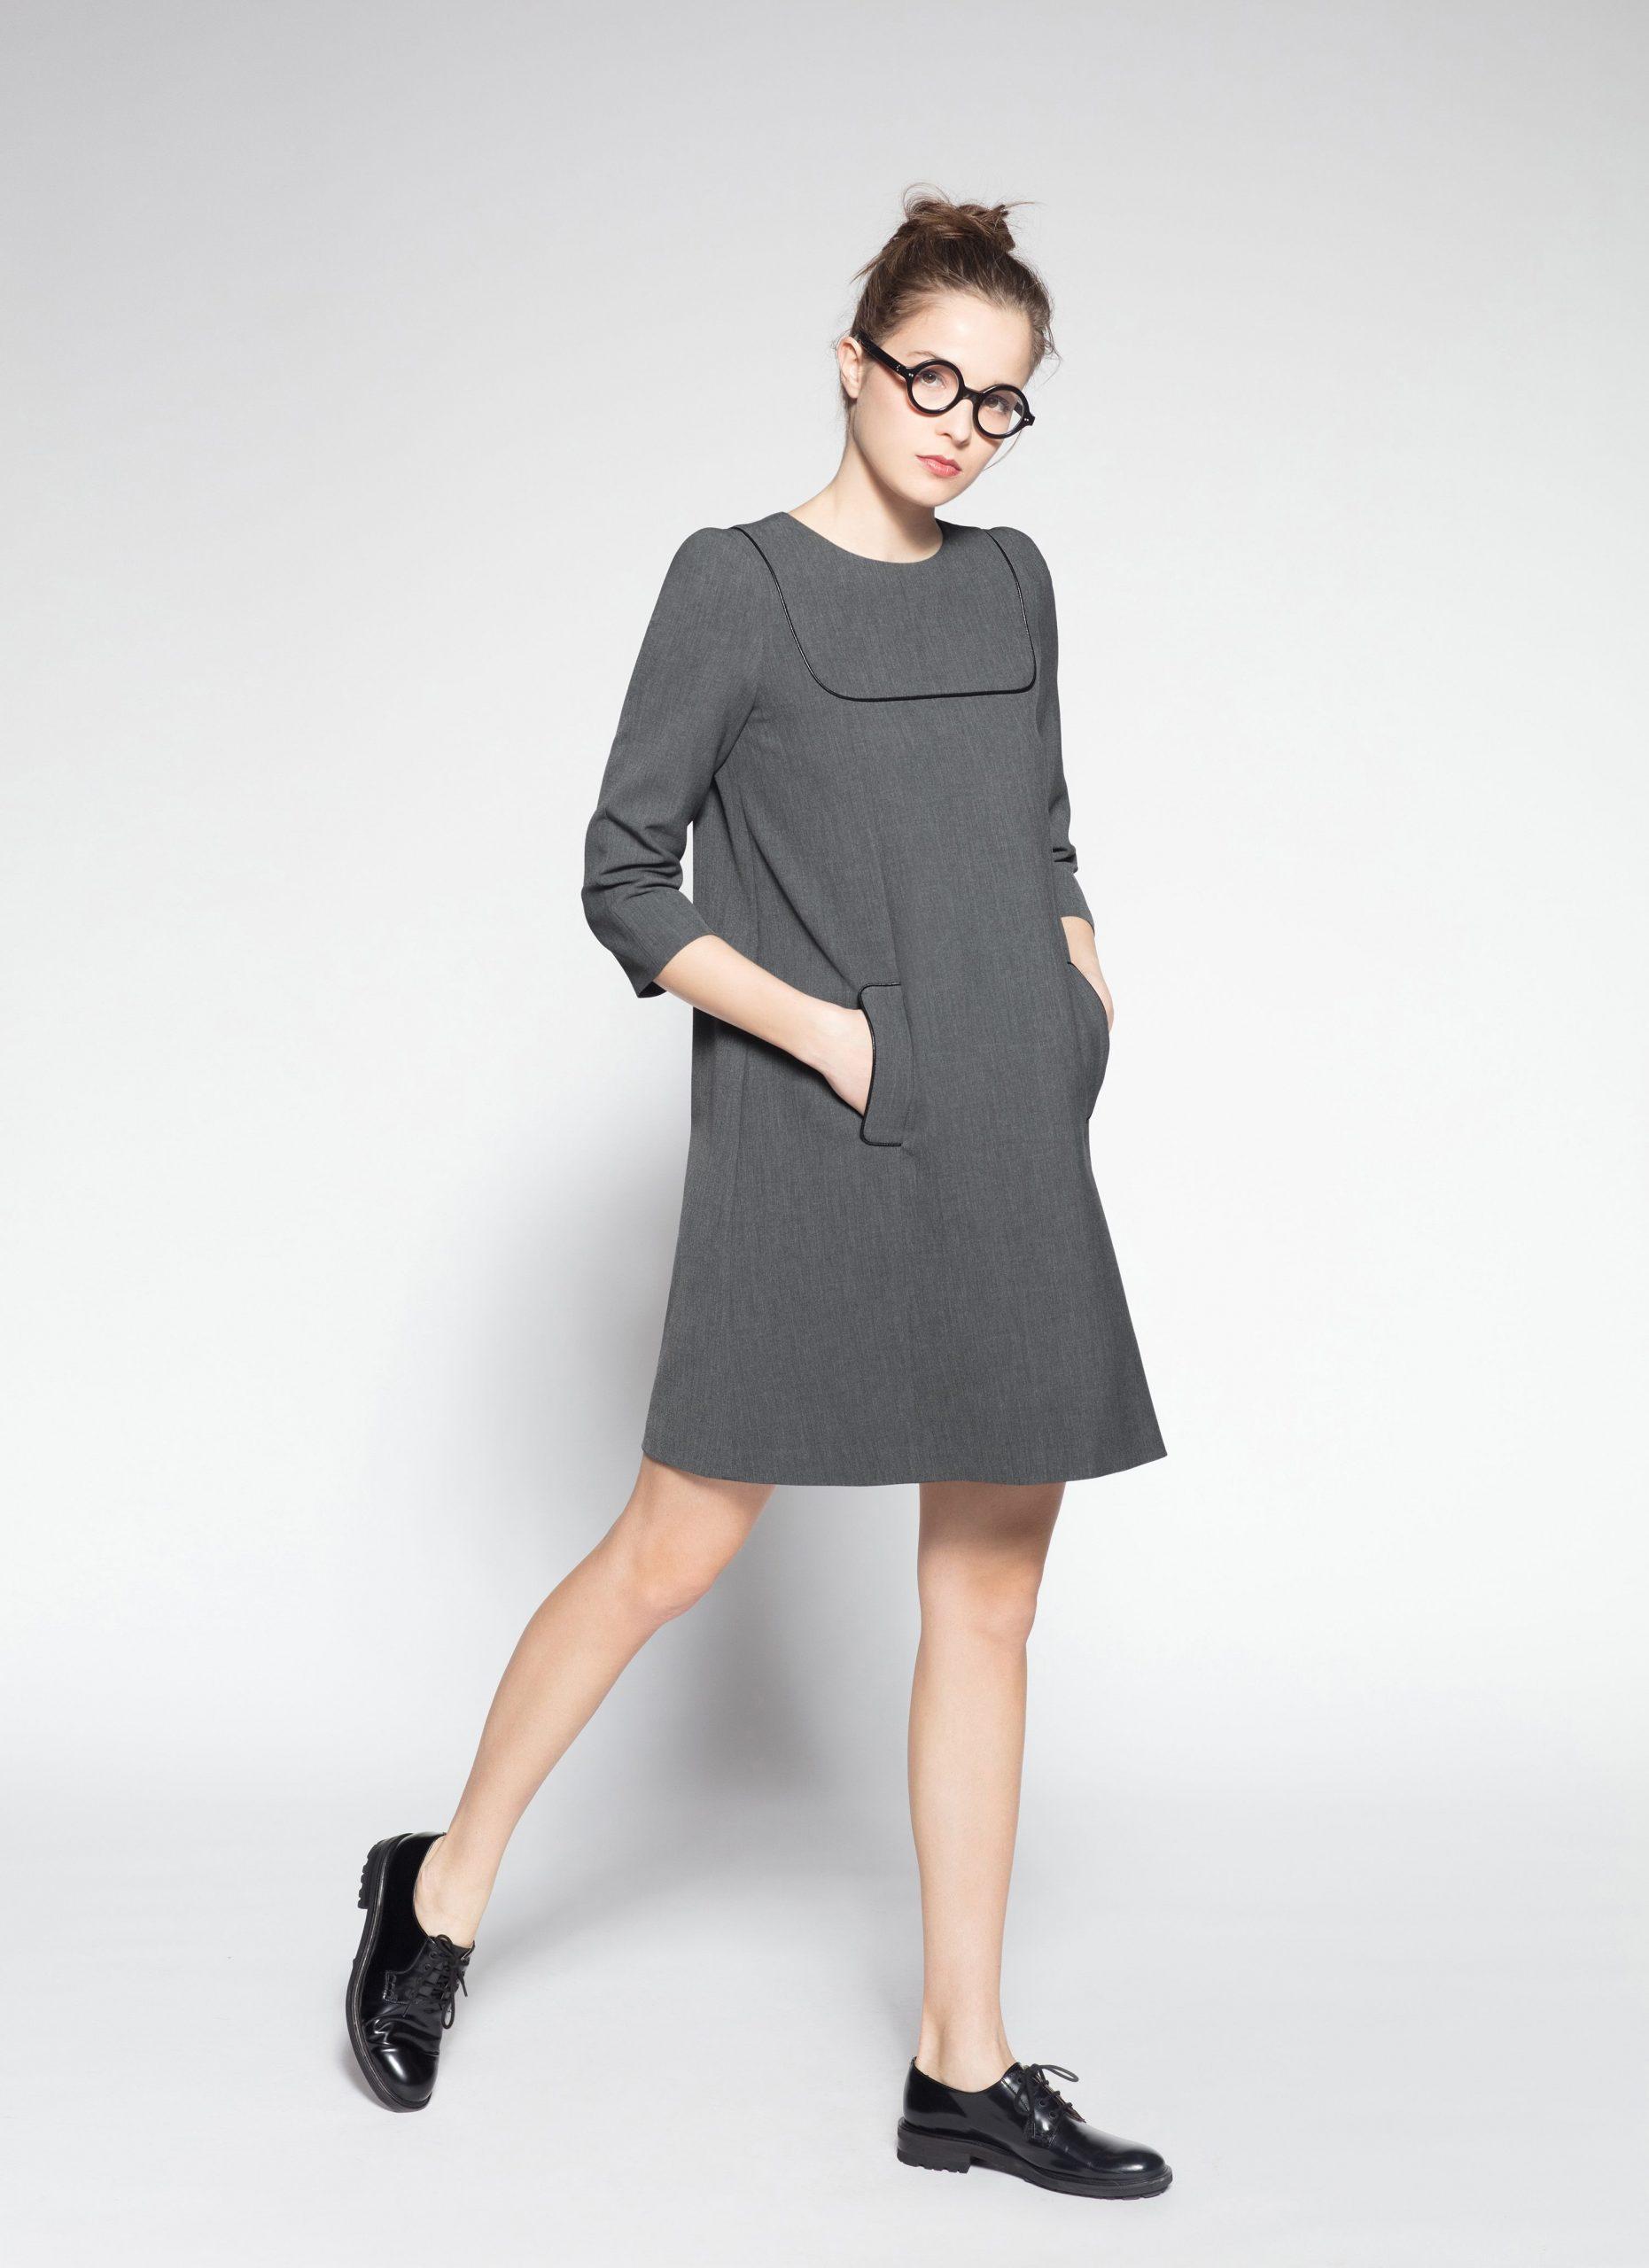 Designer Genial Kleid Grau Langarm Spezialgebiet20 Coolste Kleid Grau Langarm für 2019